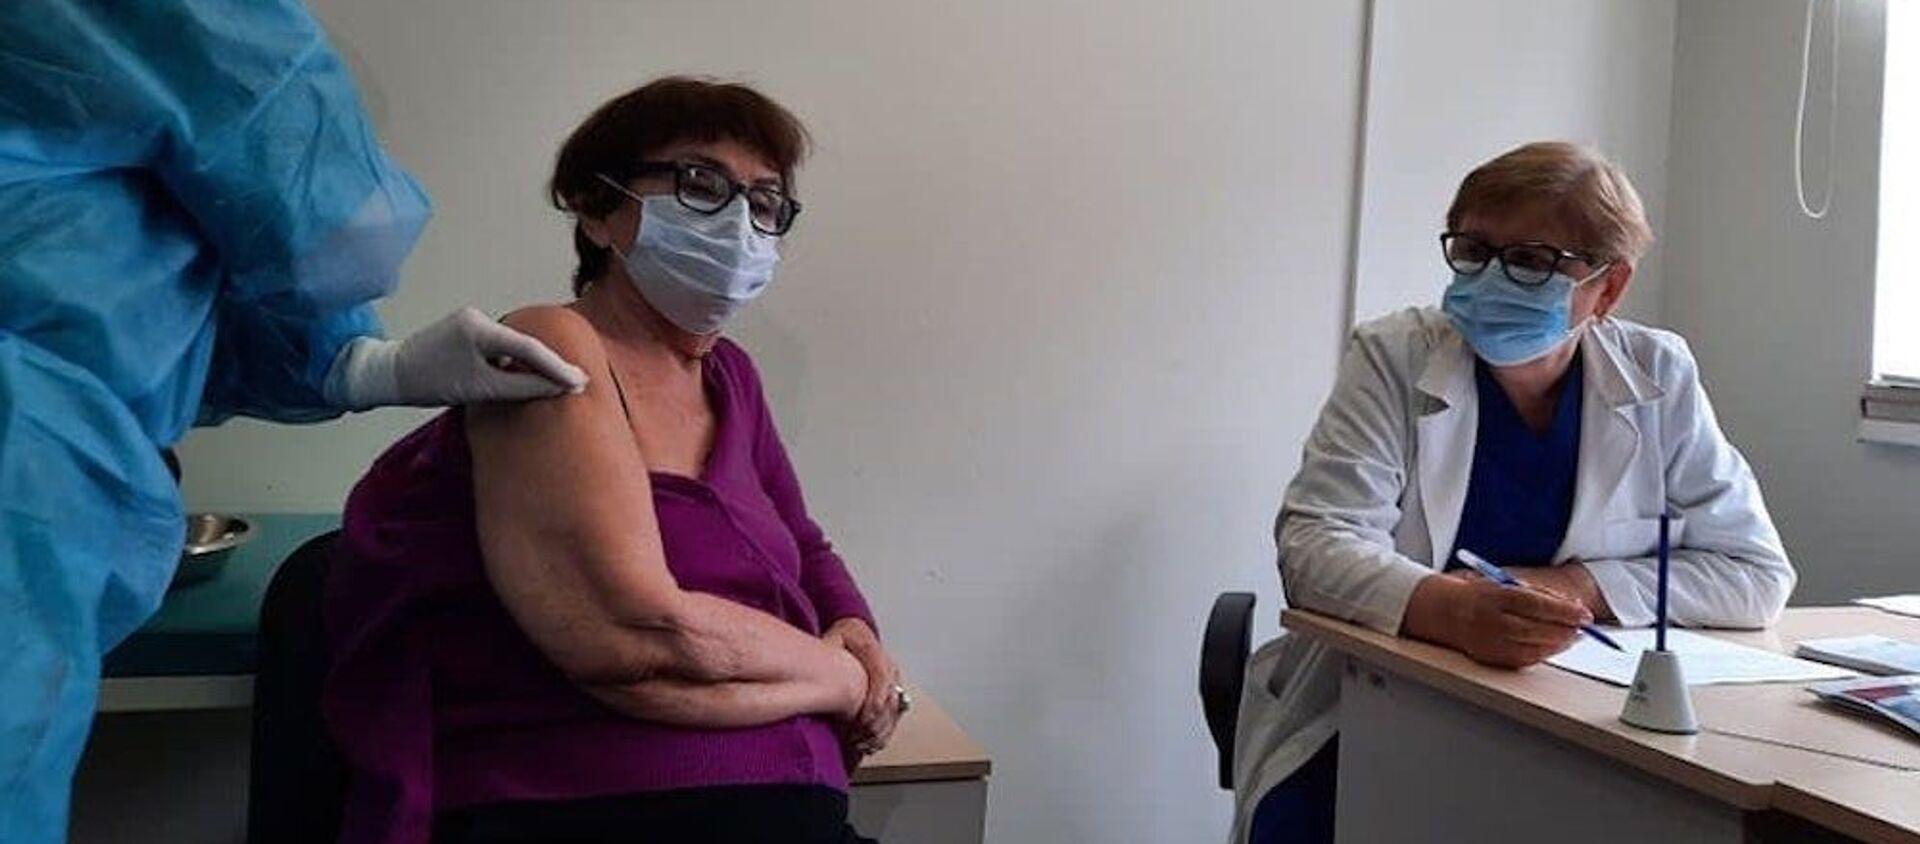 Лана Гогоберидзе сделала прививку от коронавируса - Sputnik Грузия, 1920, 30.03.2021